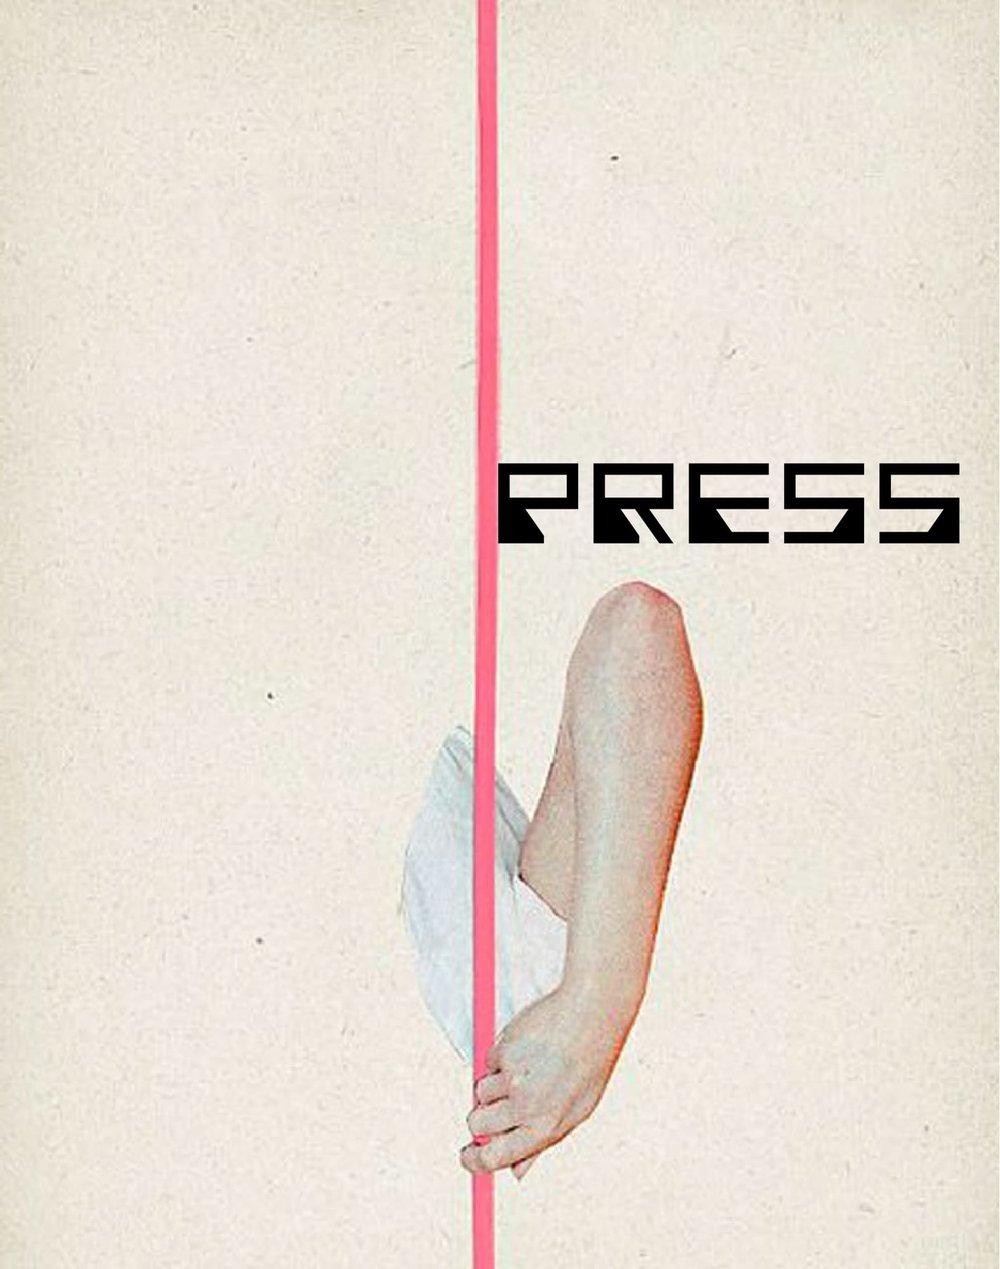 PRESS-LowRes-02.jpg